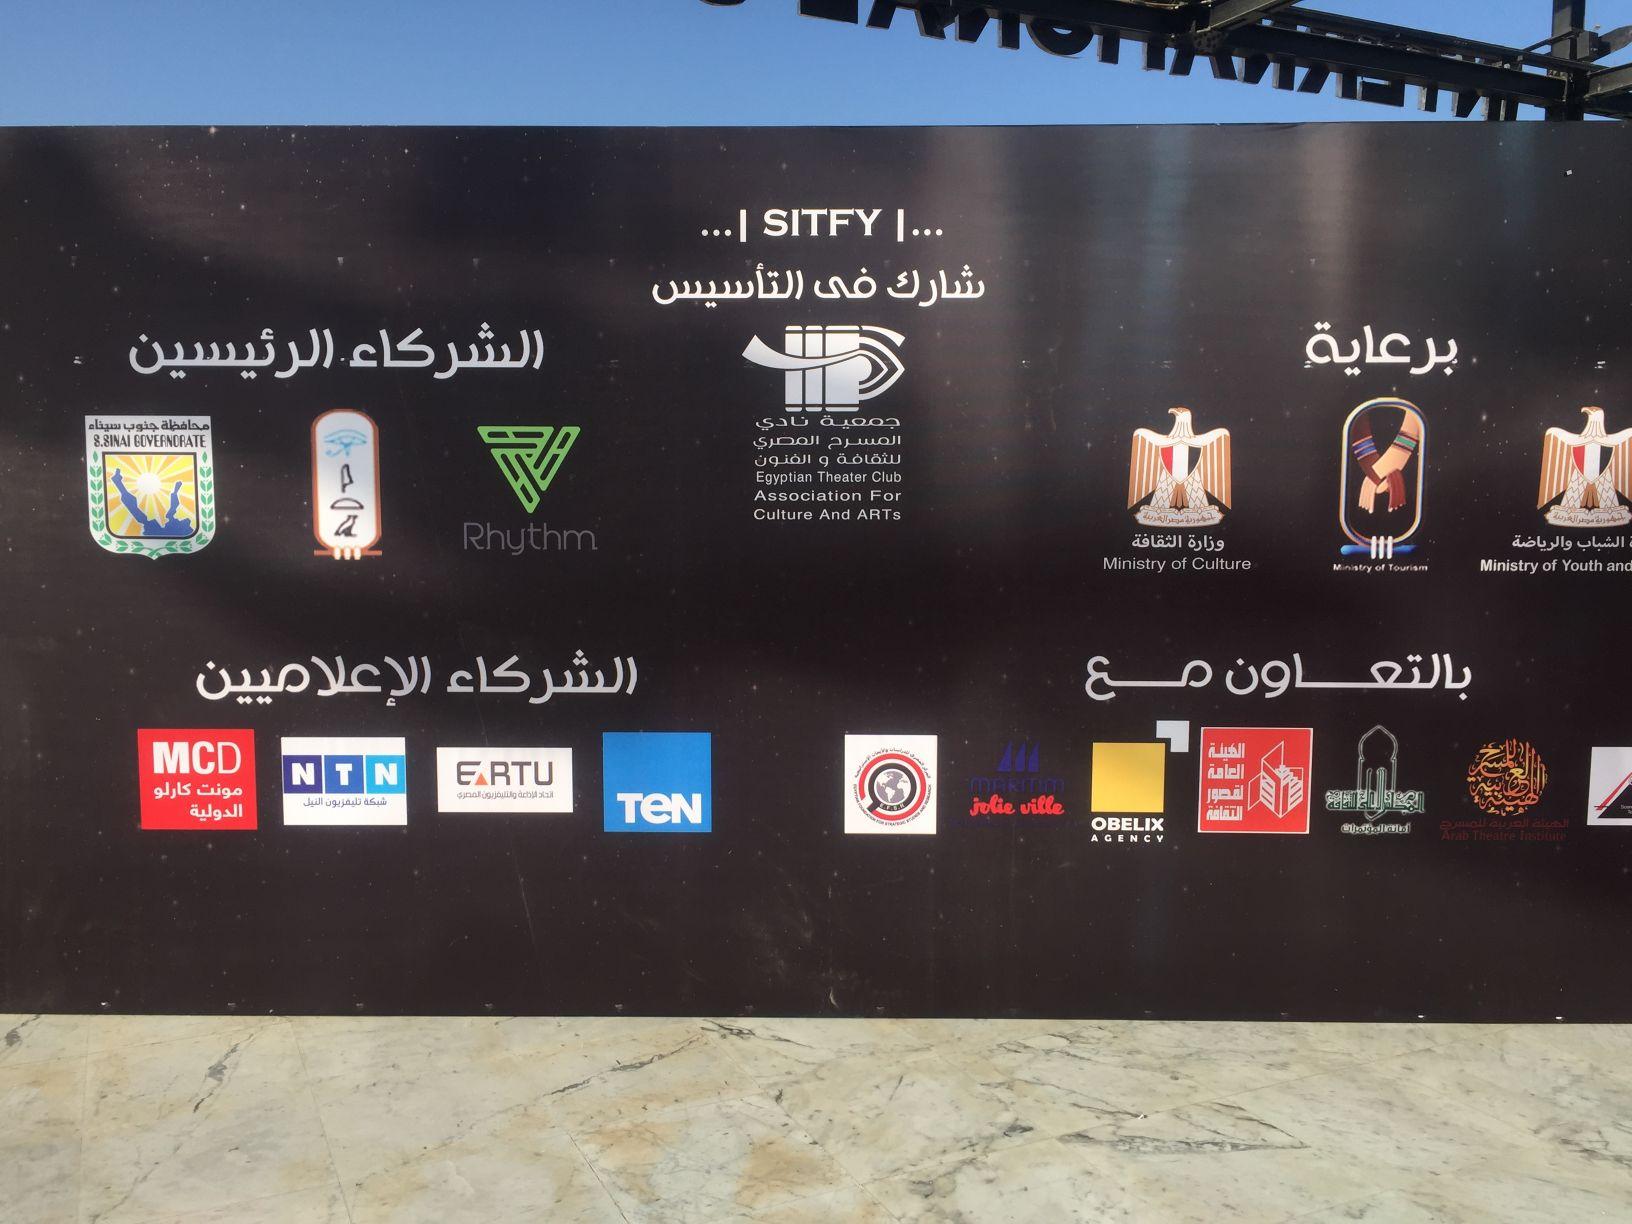 Sharm El Sheikh International Theater Festival For Youth 9